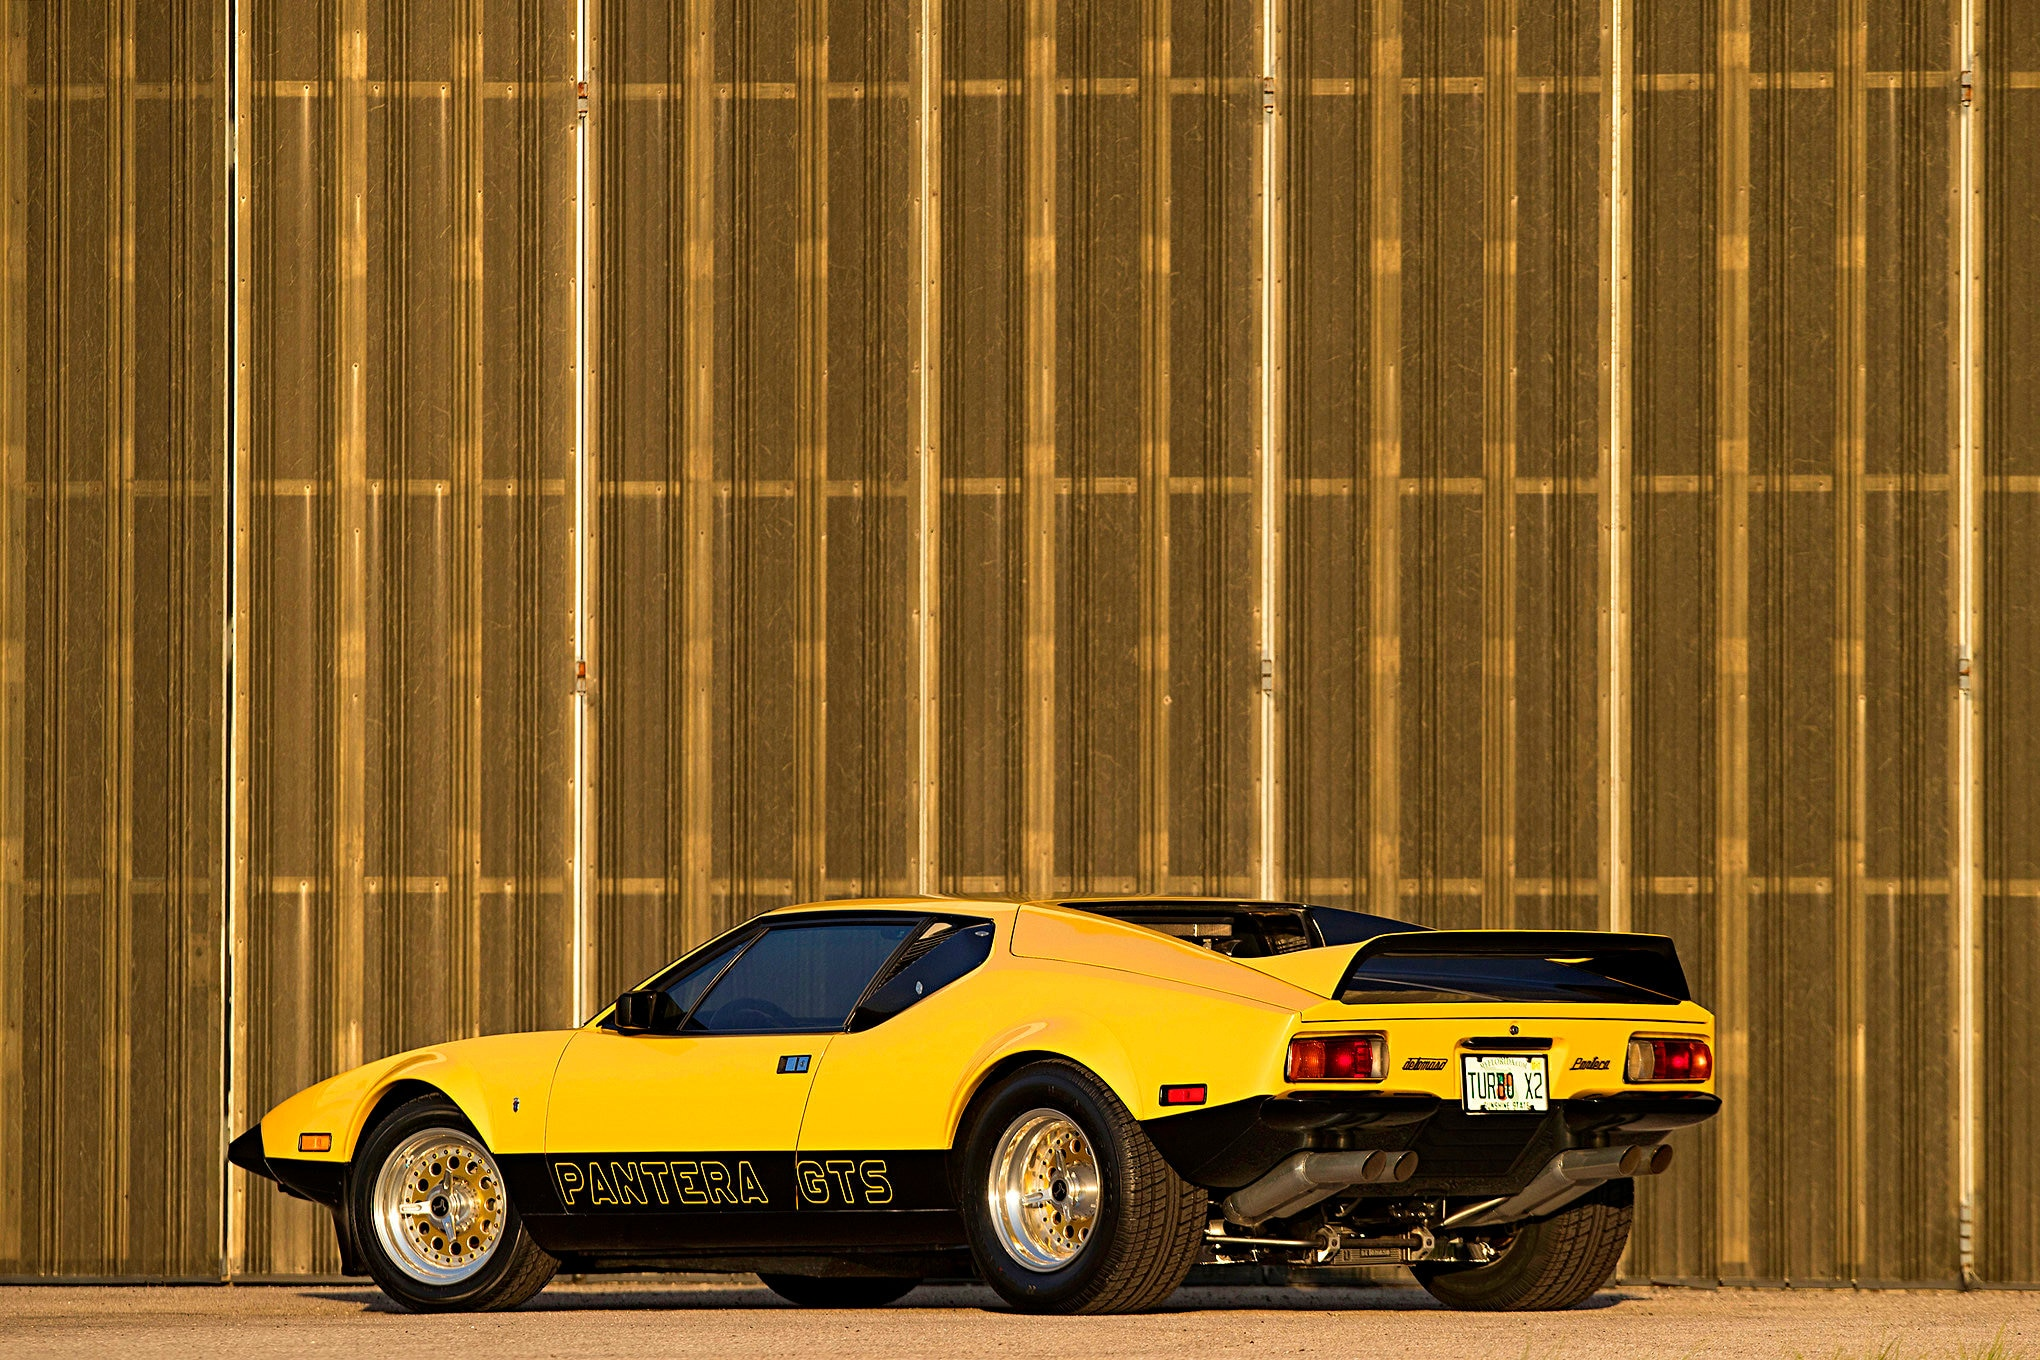 029 1974 Pantera GTS Twin Turbo